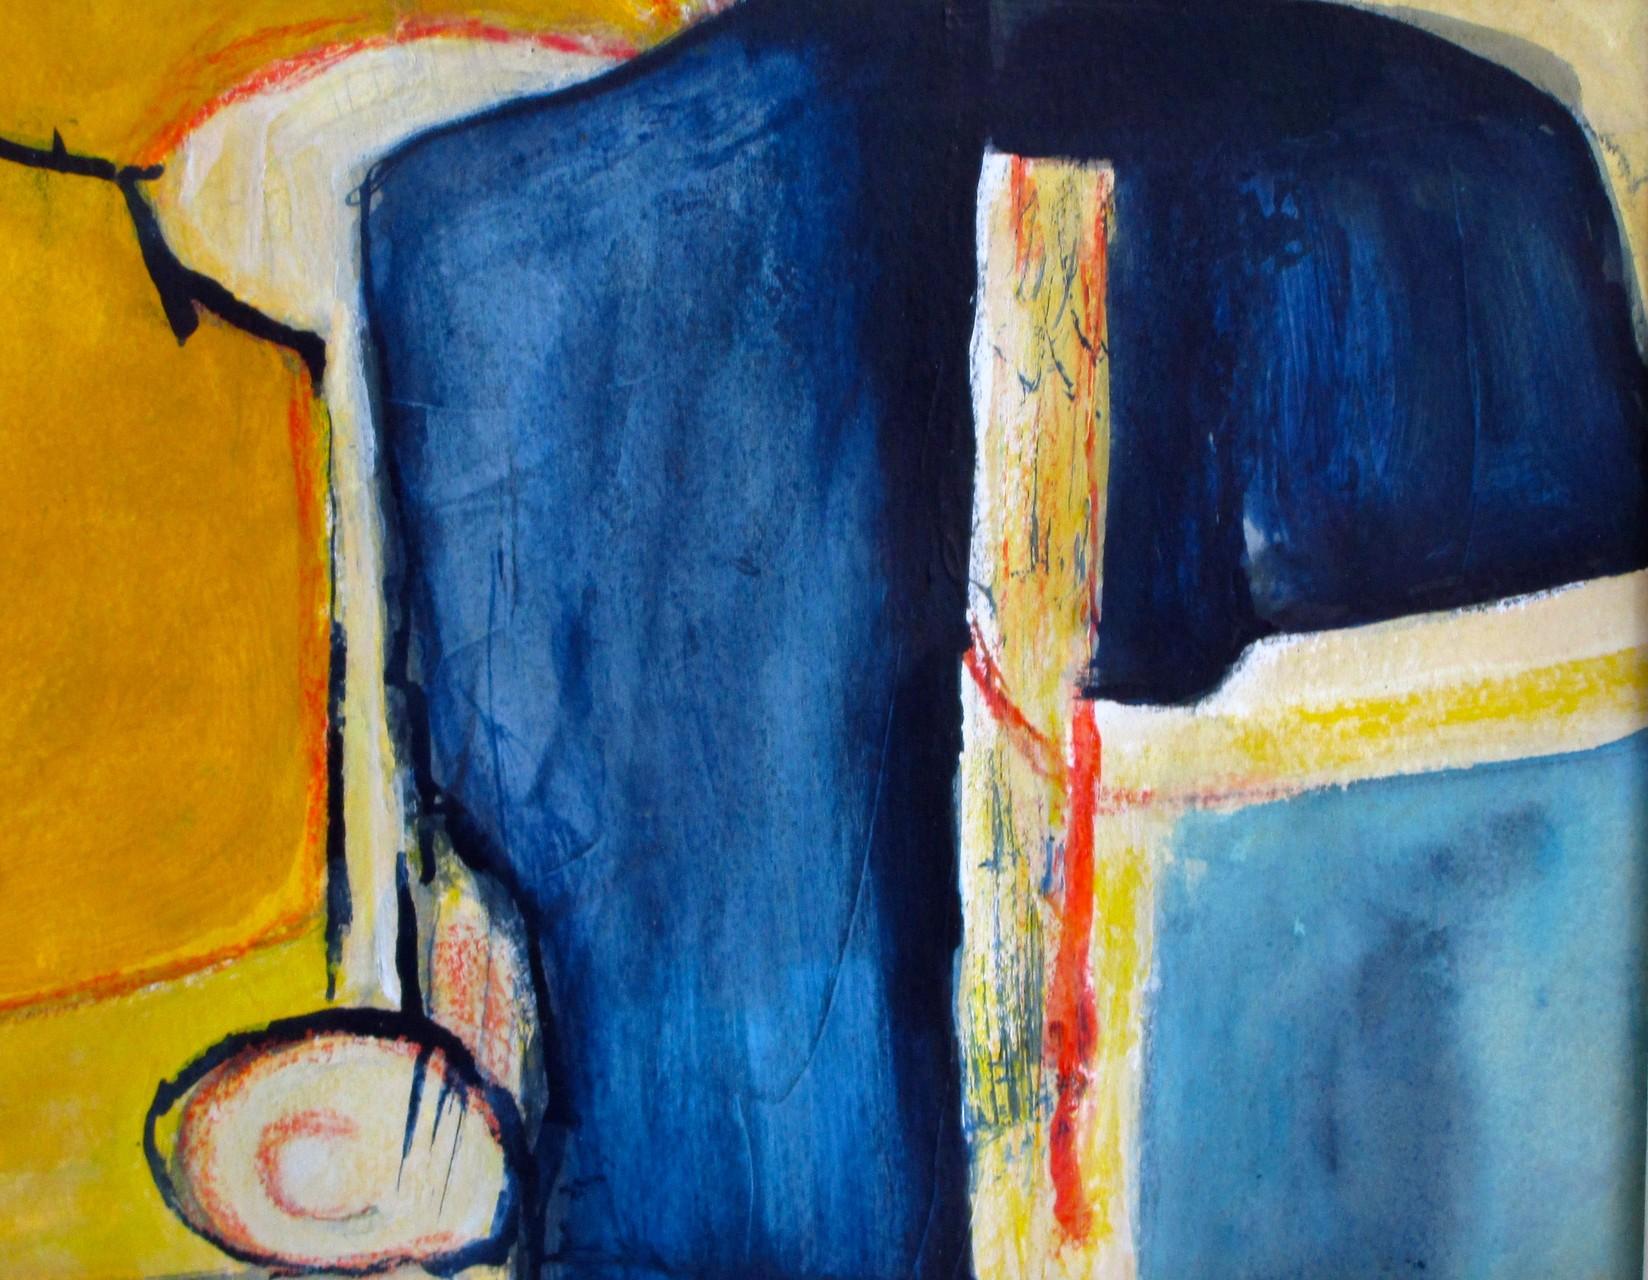 Blue Dawn, watercolor, 9.5 x 7.5, 2015